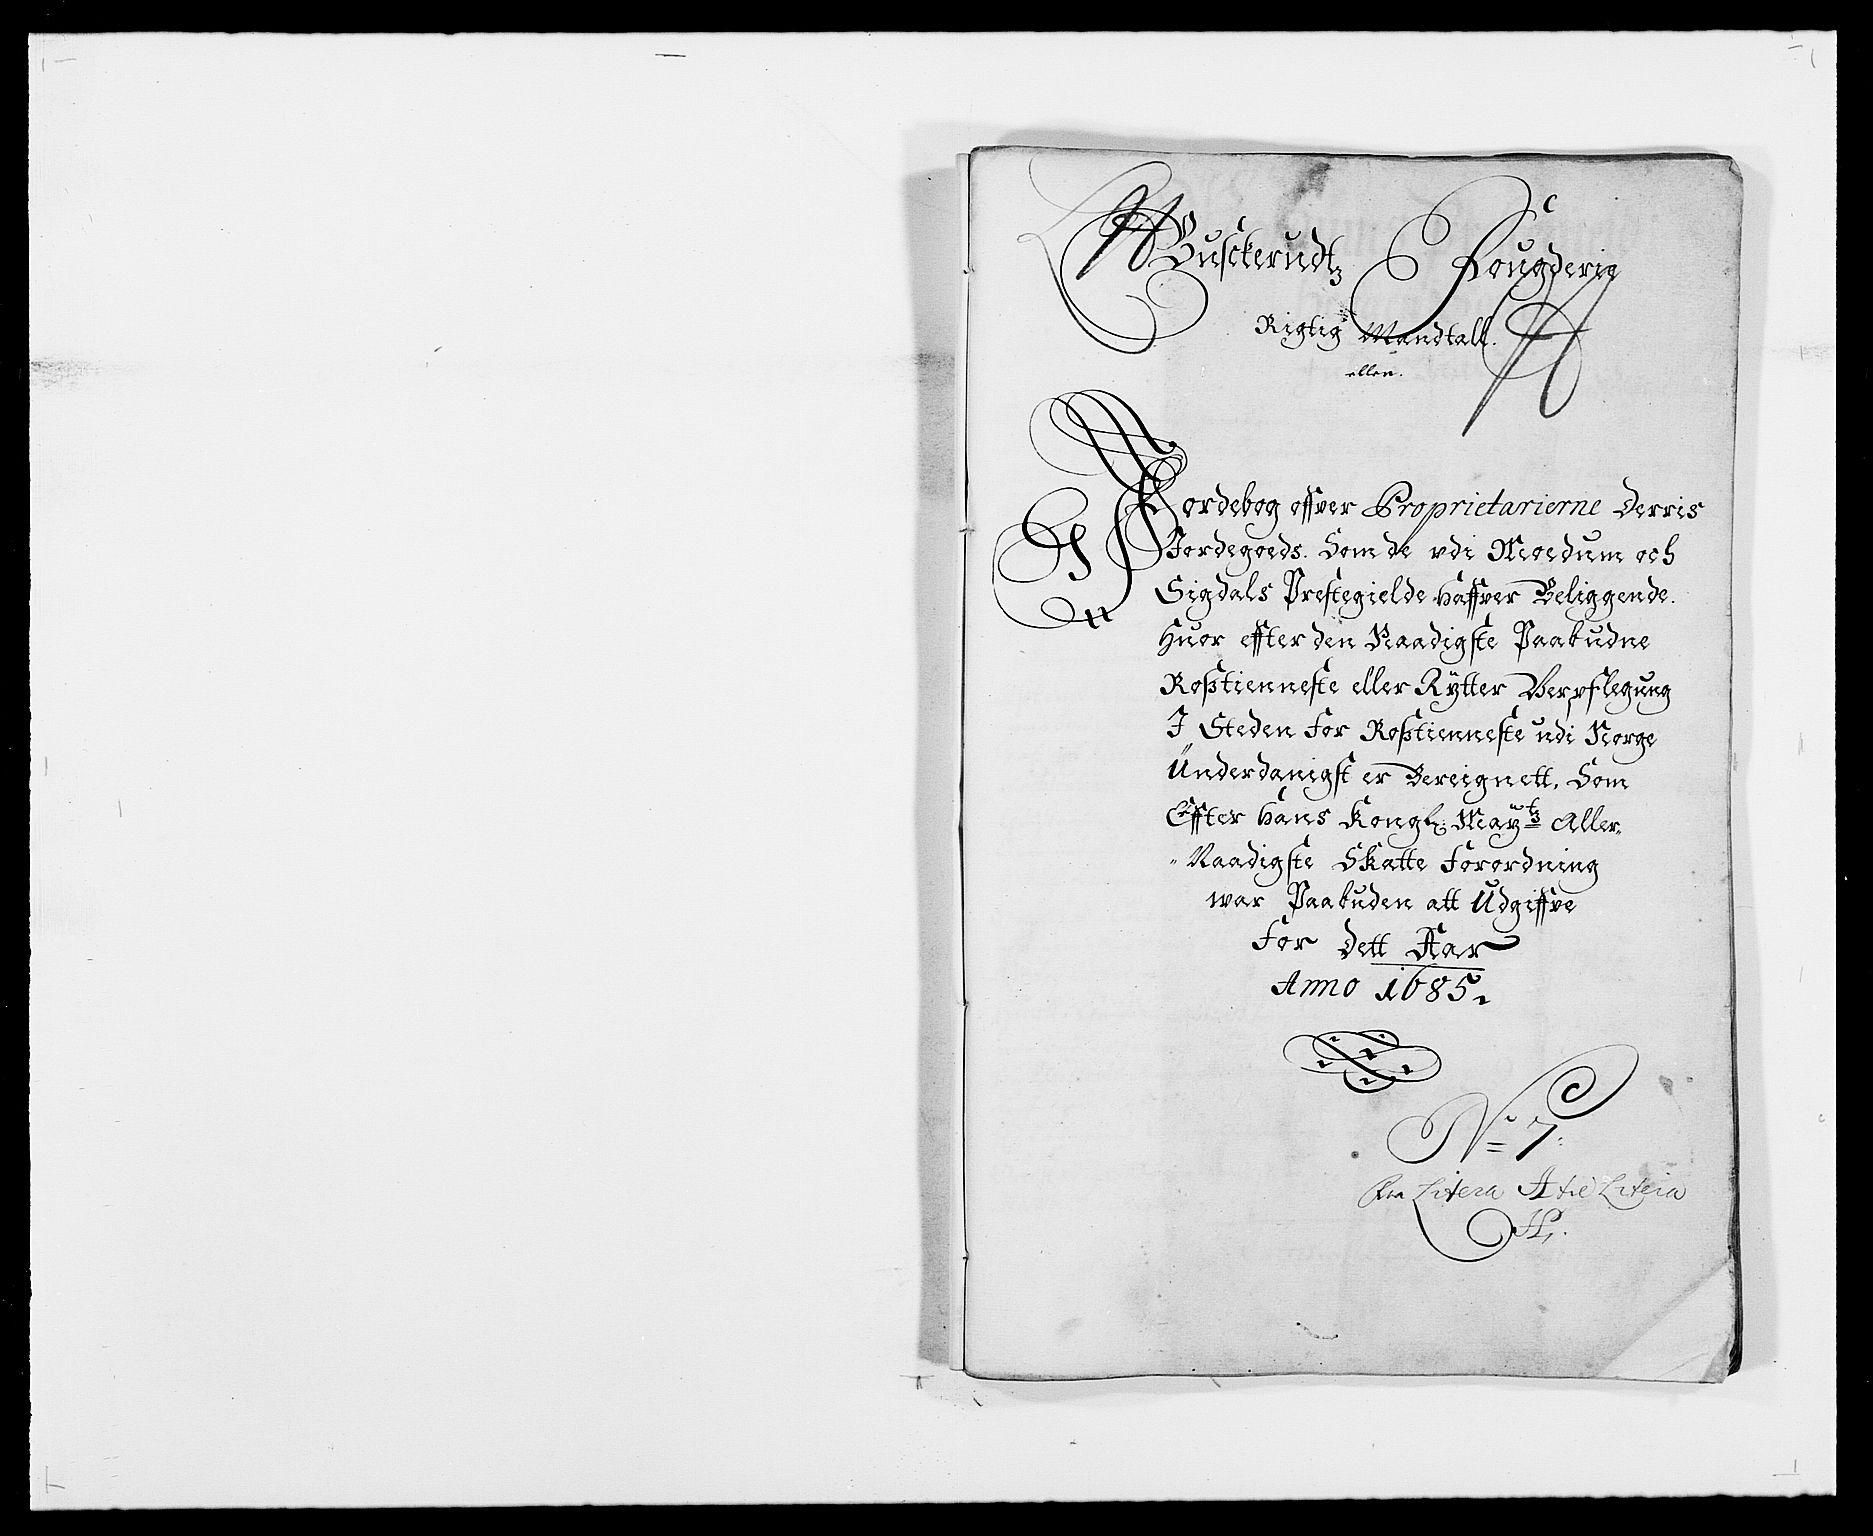 RA, Rentekammeret inntil 1814, Reviderte regnskaper, Fogderegnskap, R25/L1678: Fogderegnskap Buskerud, 1685-1686, s. 148